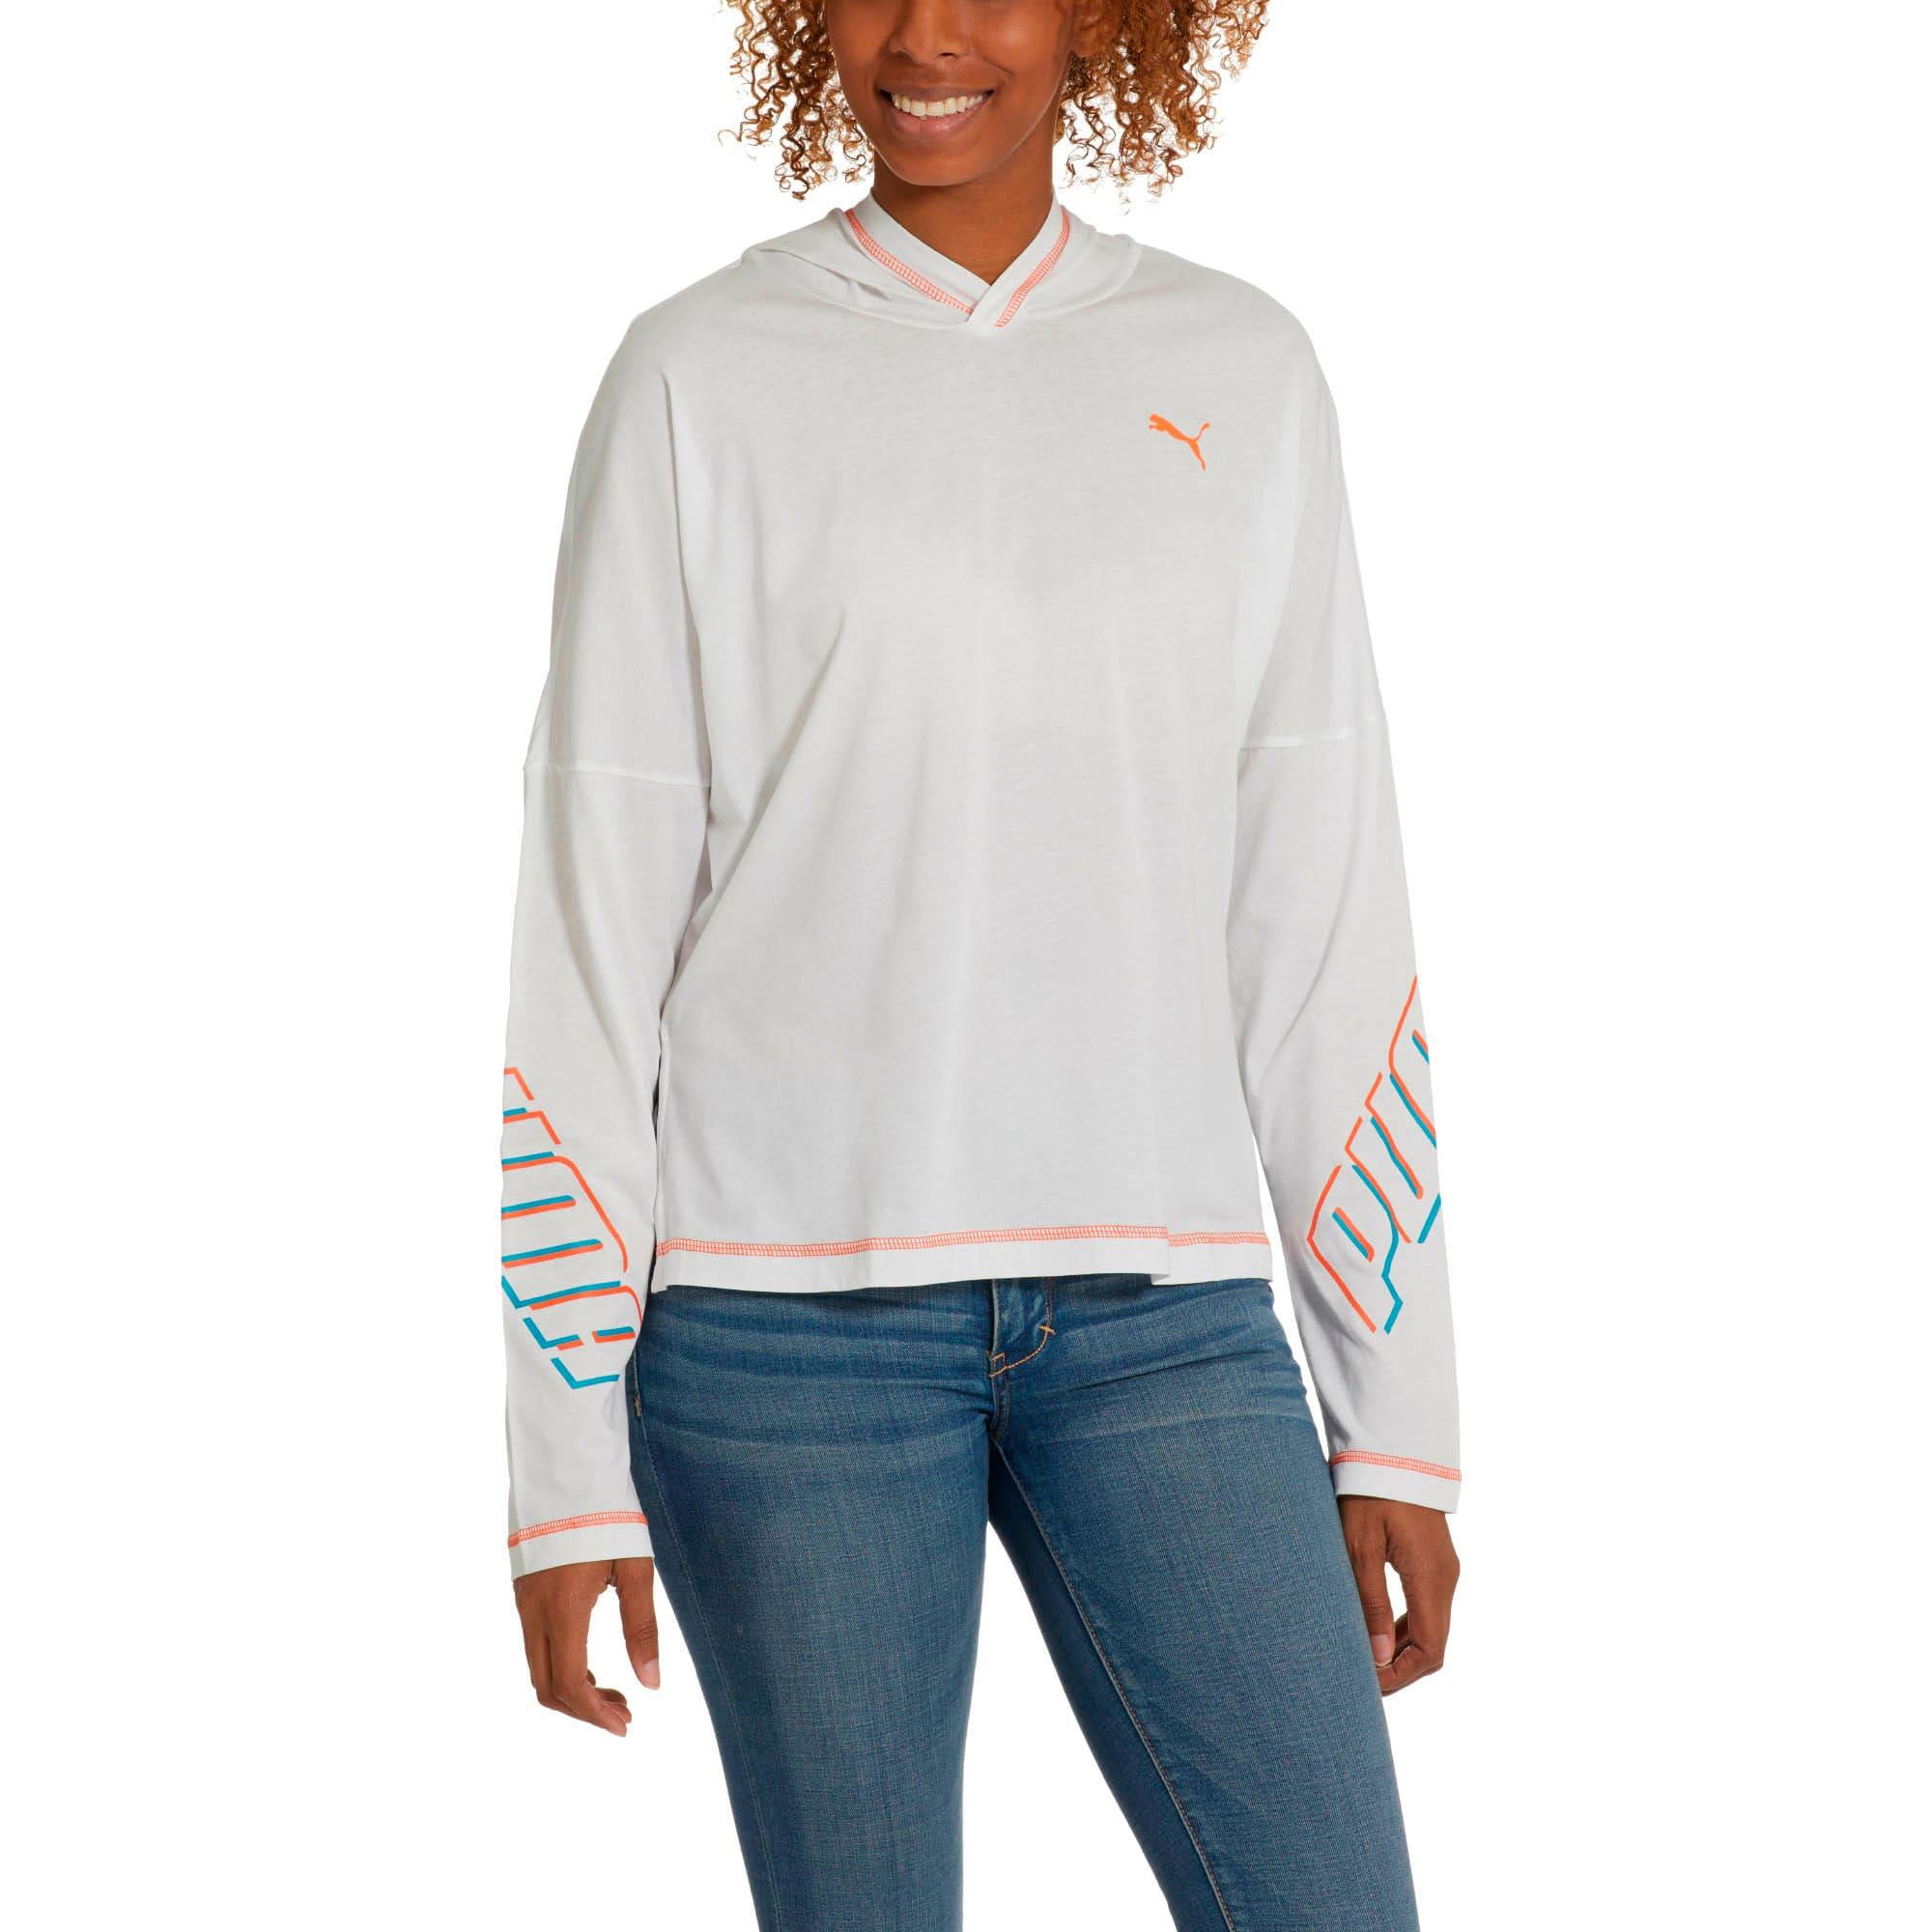 Miniatura 1 de Top liviano Modern Sports para mujer, Puma White, mediano